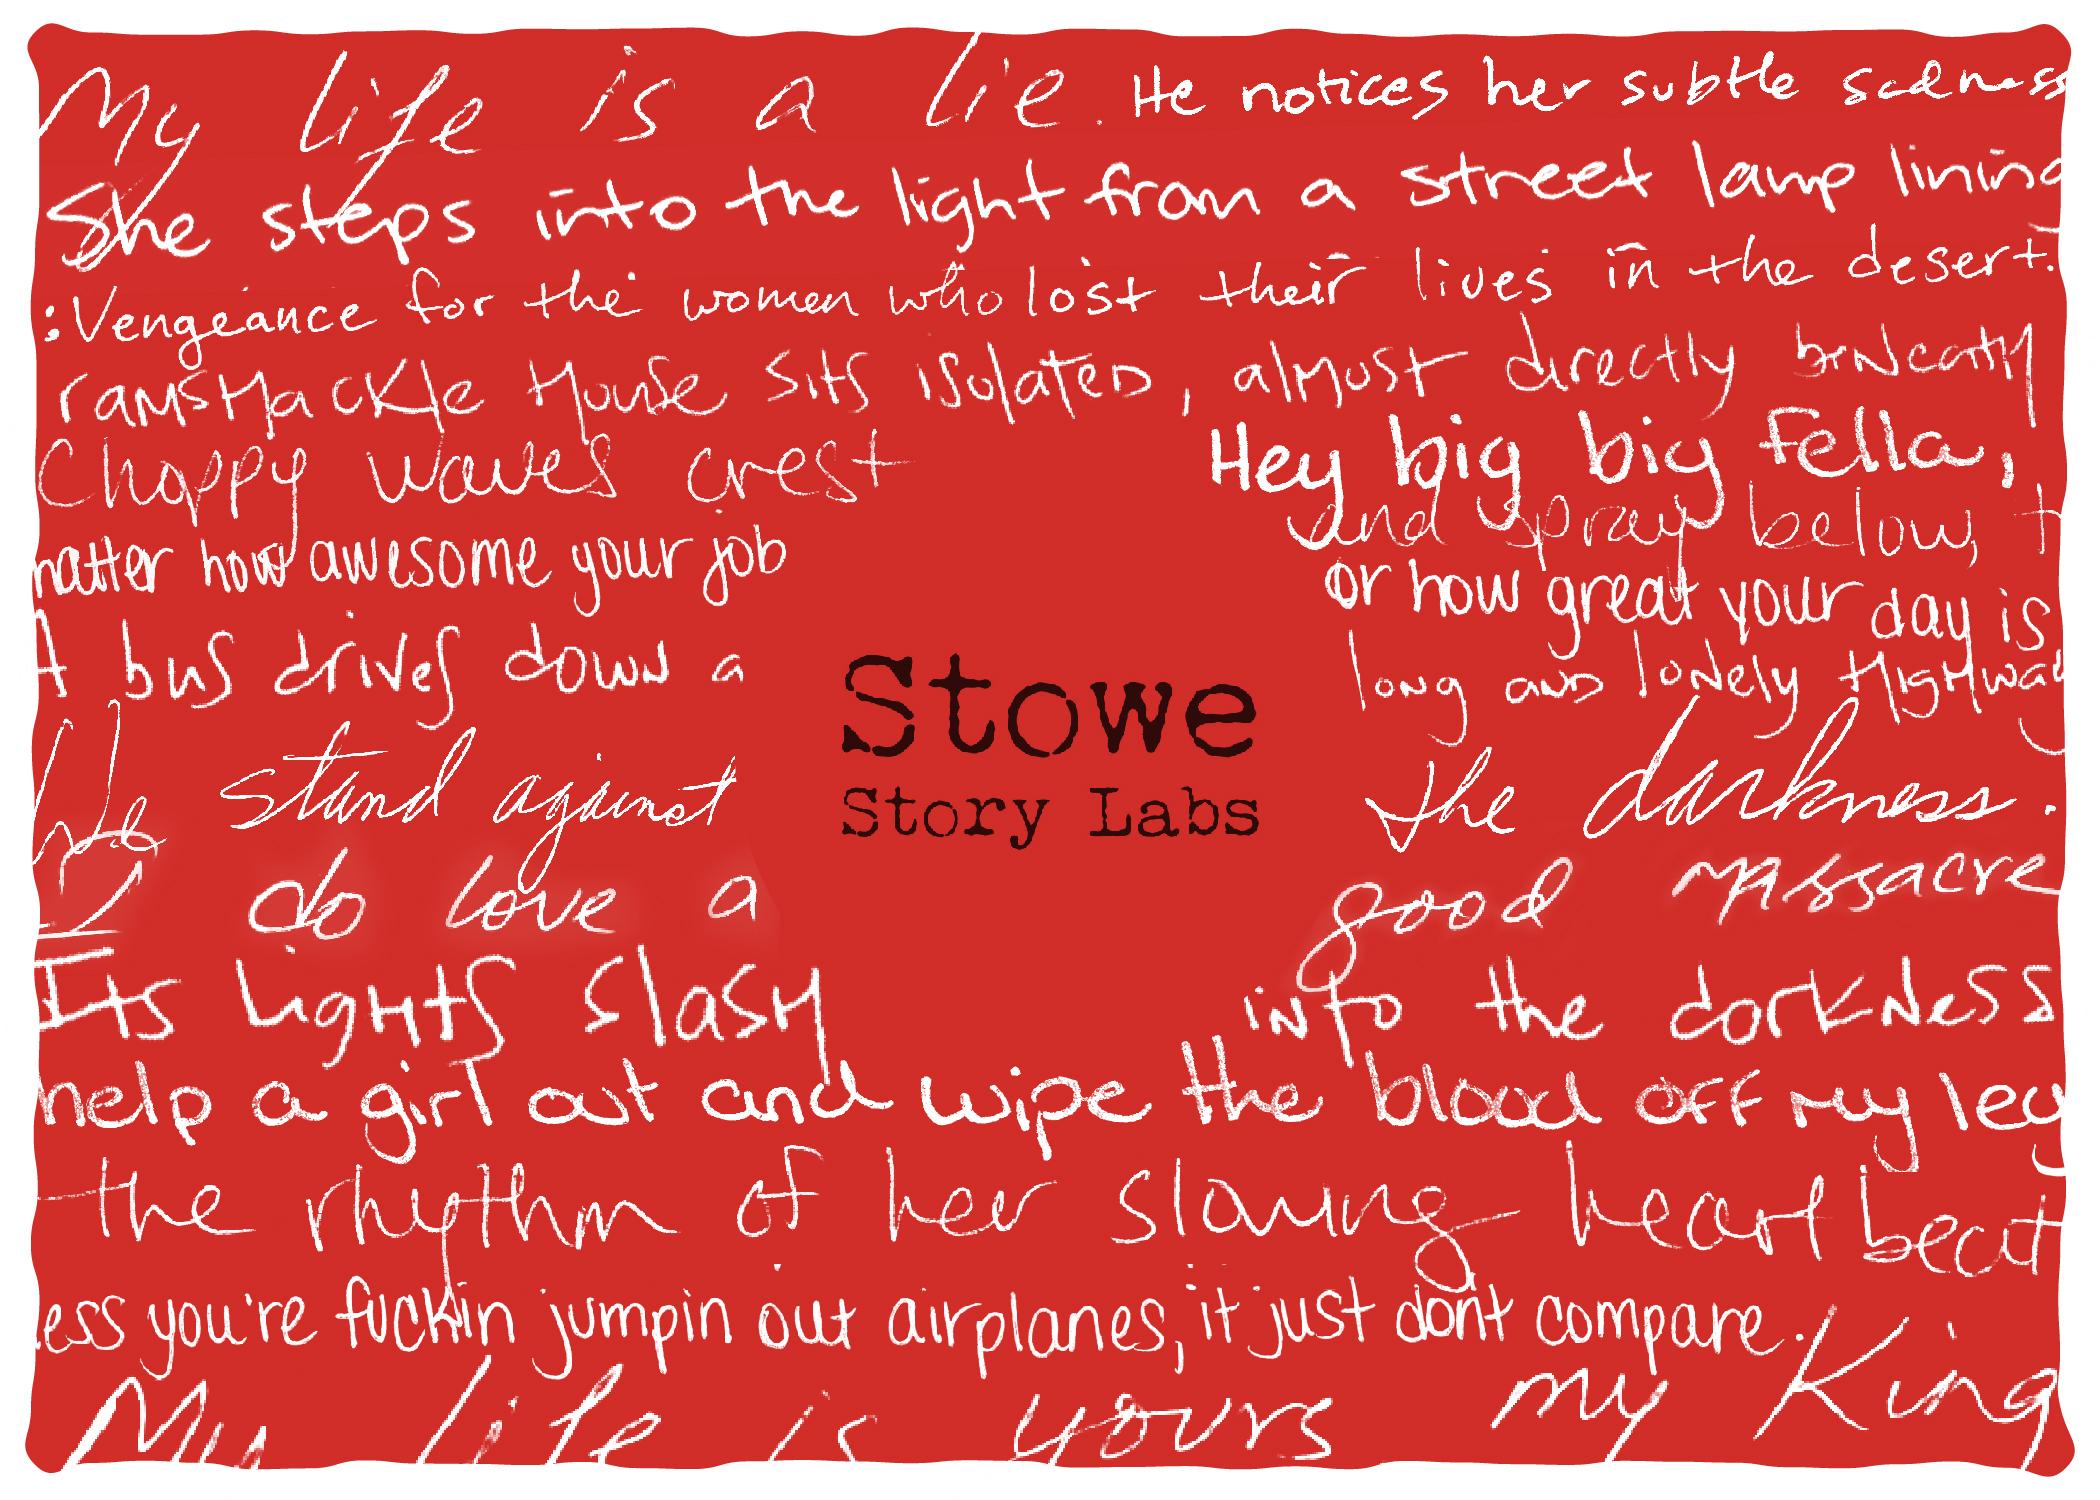 Stowe Story Labs alumni contributing words from scripts for this card: April Sanchez, Elise Salomon, Nikhil Kamkolkar, Dina Fiasconaro, Benedict Campbell, Tisha Robinson-Daly, Melody Cooper and Teresa Warner . Card designed by alumni  Jen West .